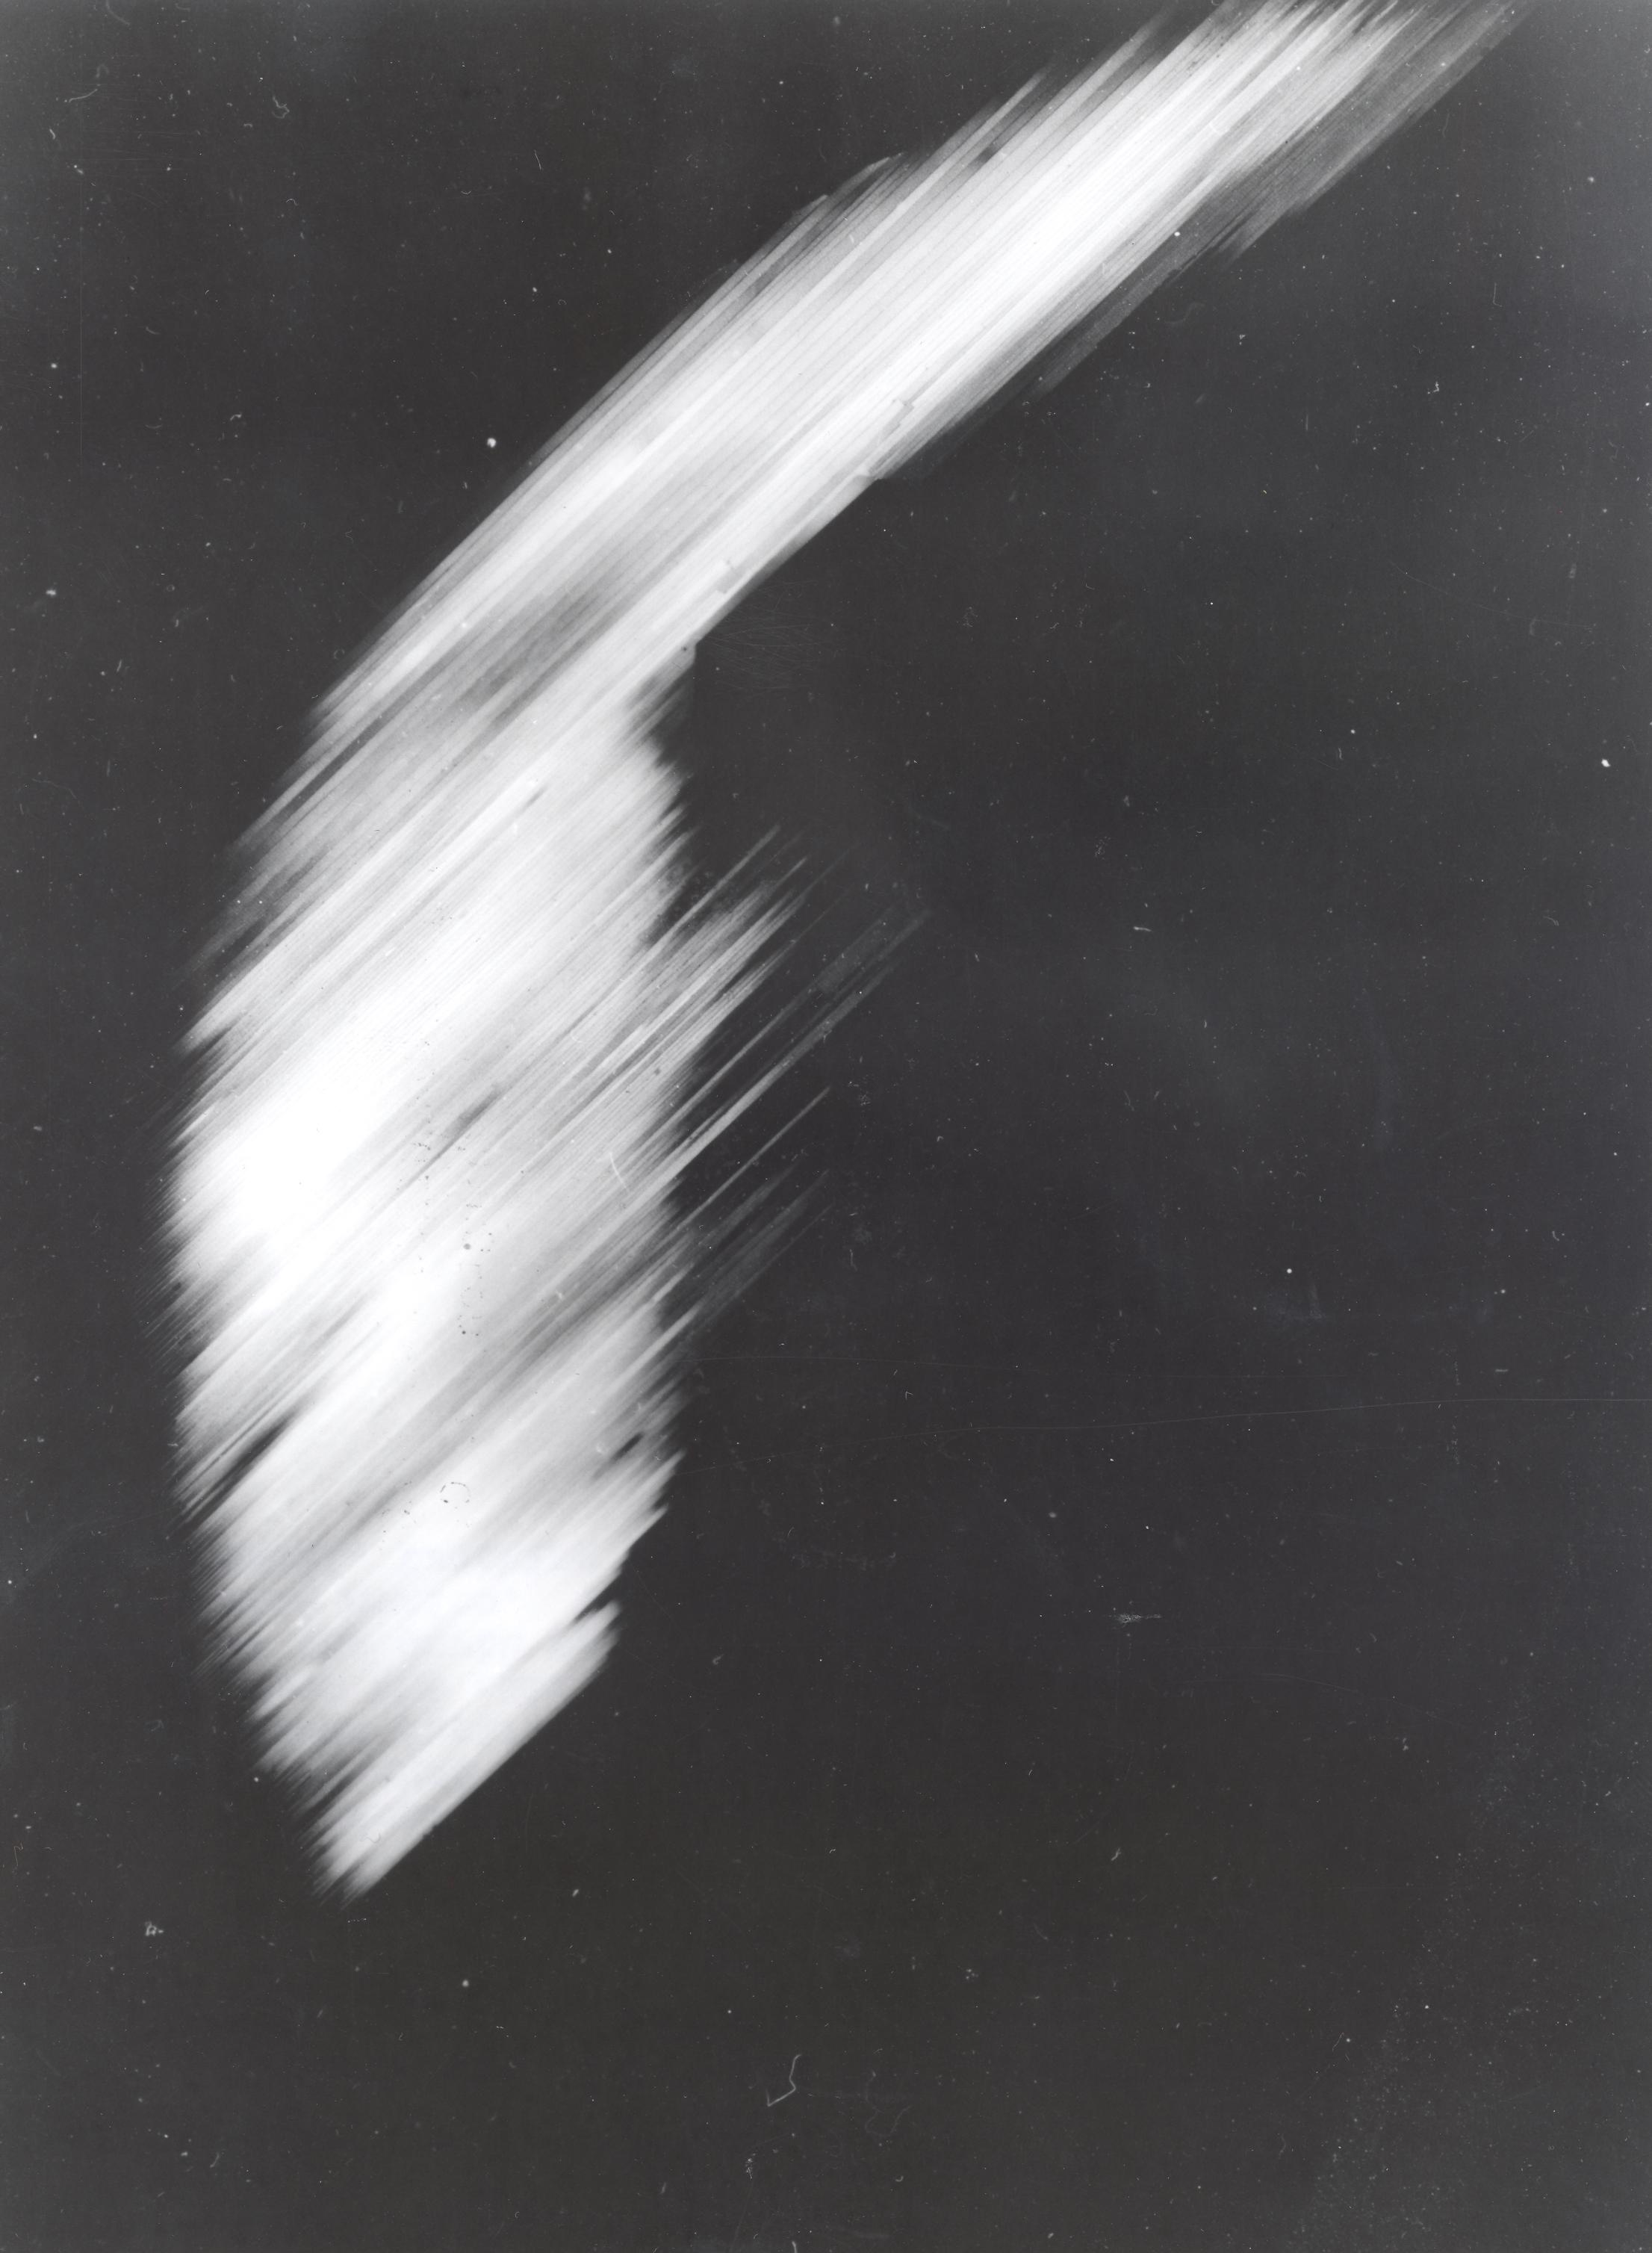 FileFirst Satellite Photo